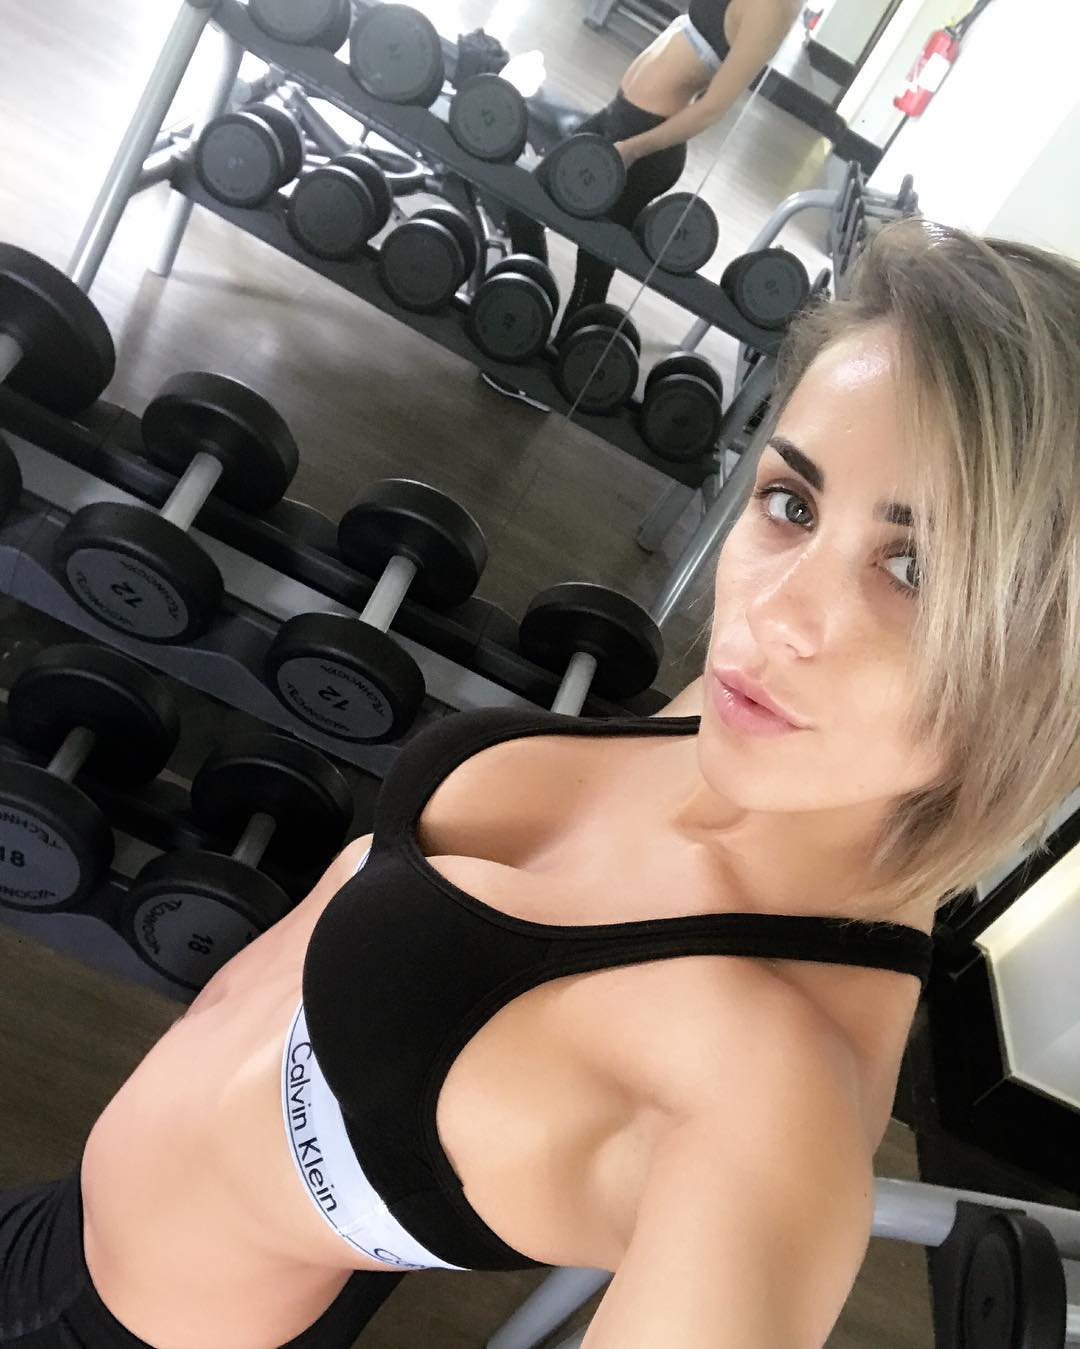 Jade Laroche Instagram username